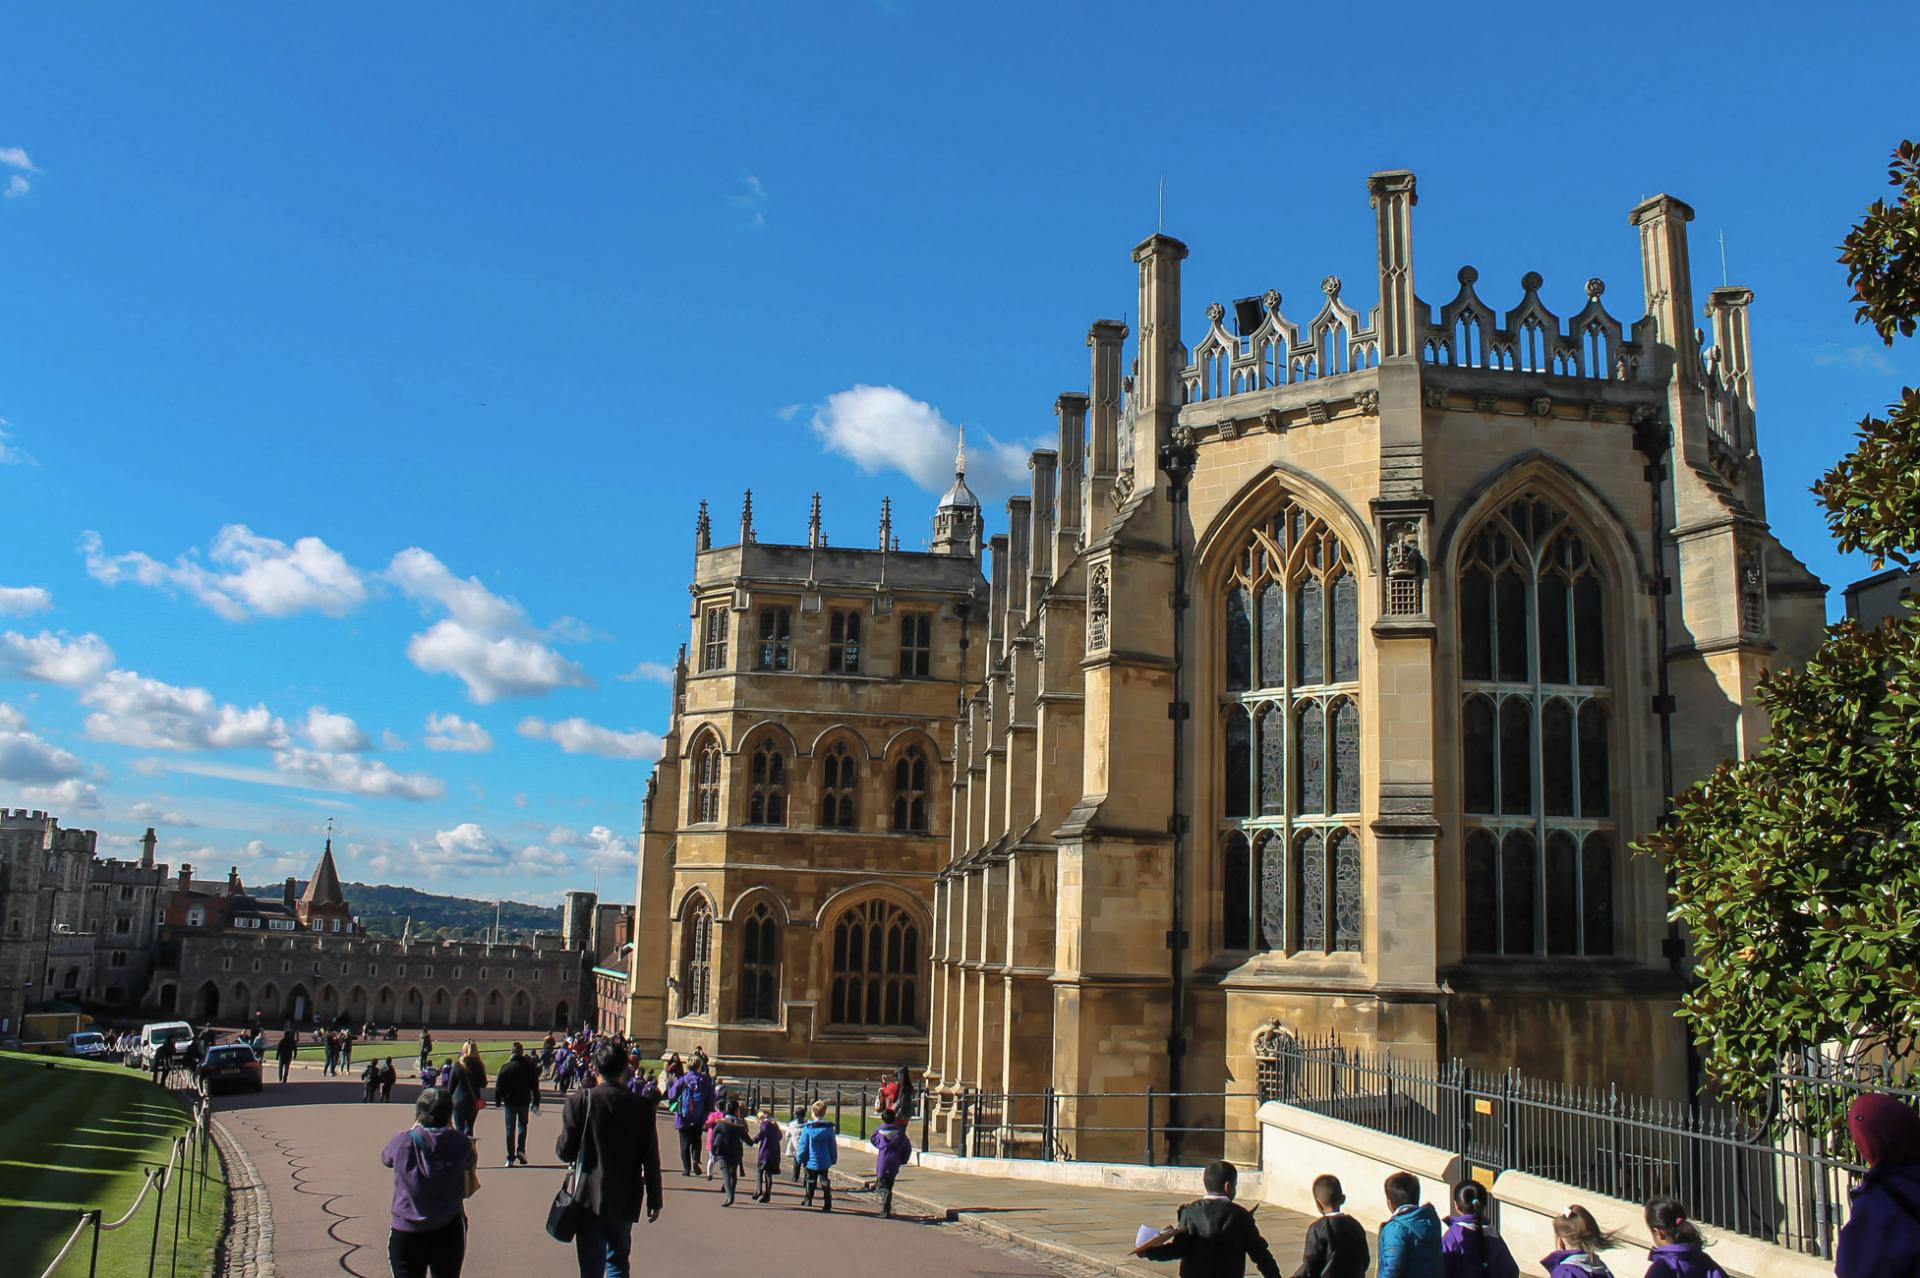 Visitar el Windsor Castle